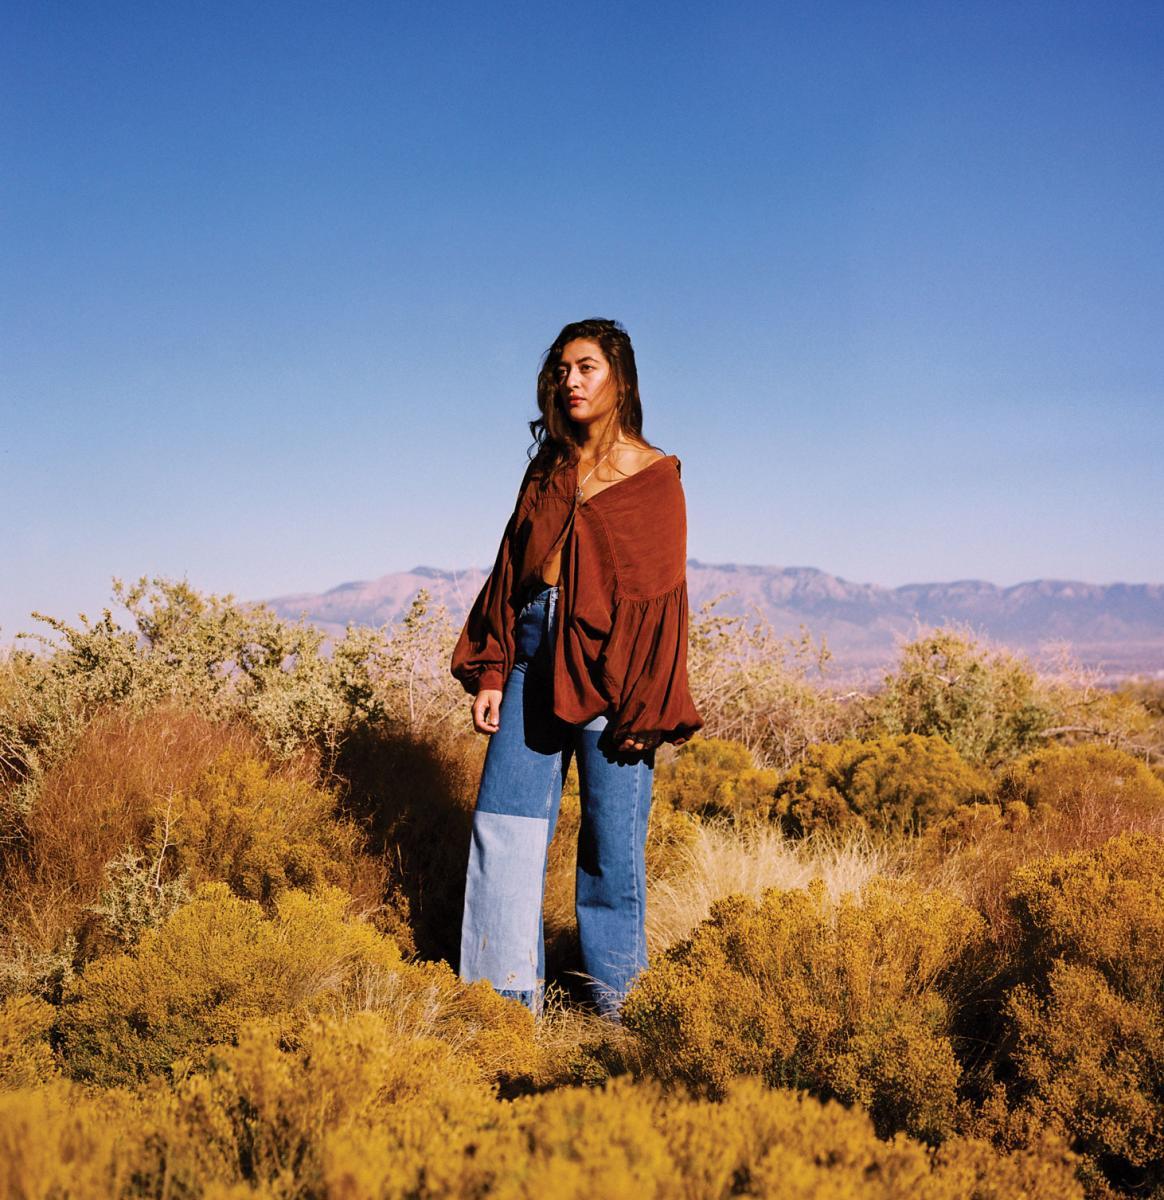 Jenn Carrillo creates poignant portraits.